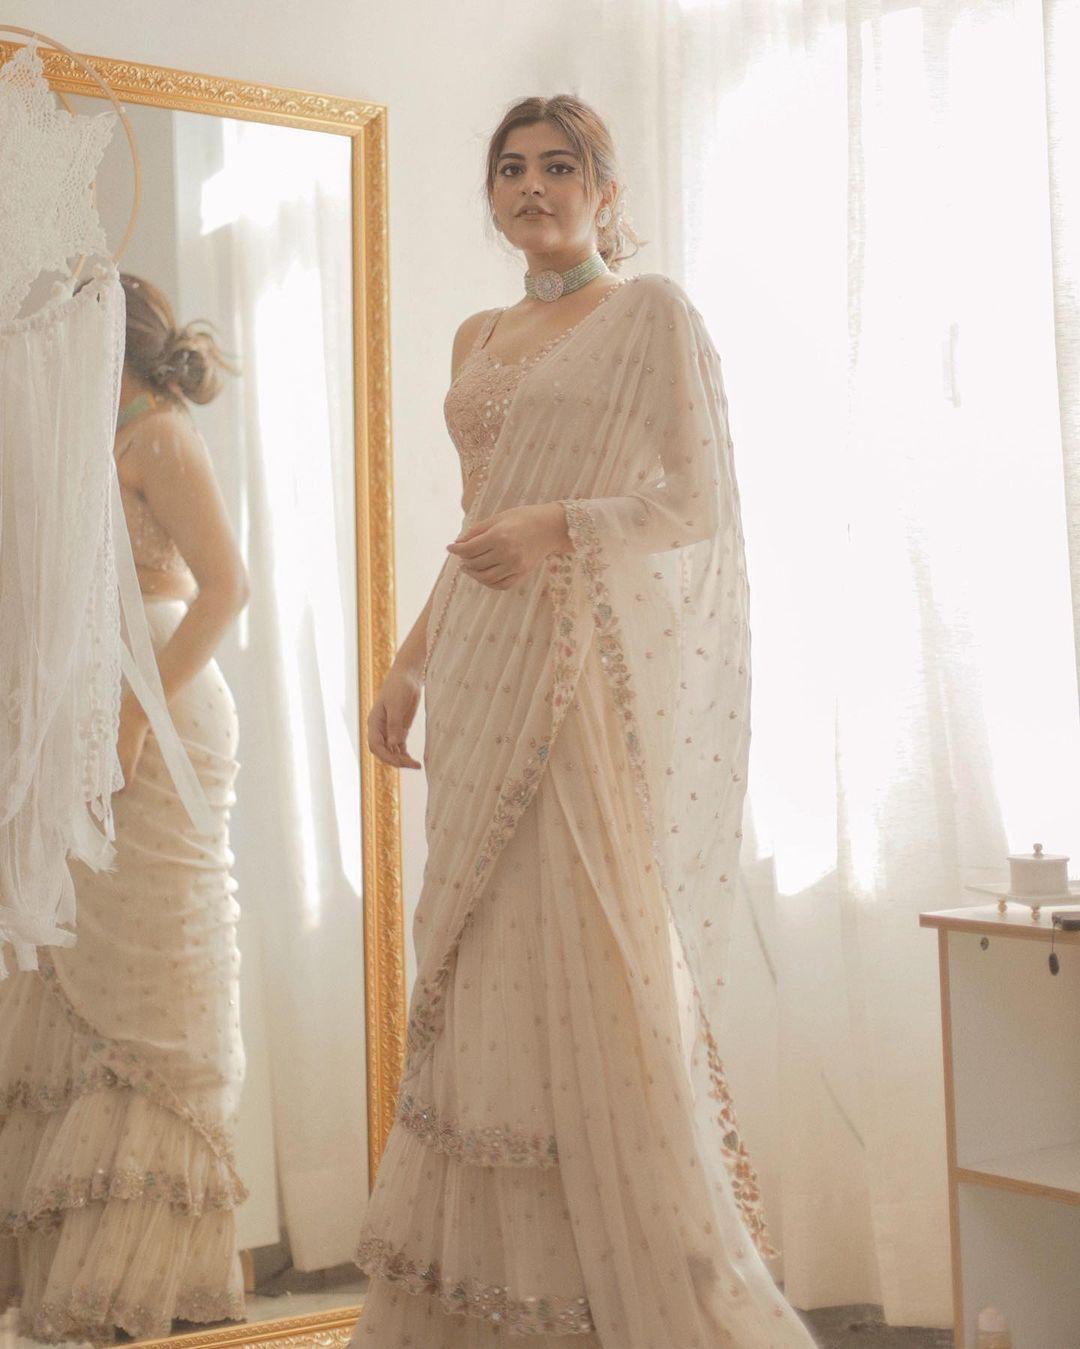 Kritika Khurana is looking super gorgeous in this sari from designer Arpita Mehta.